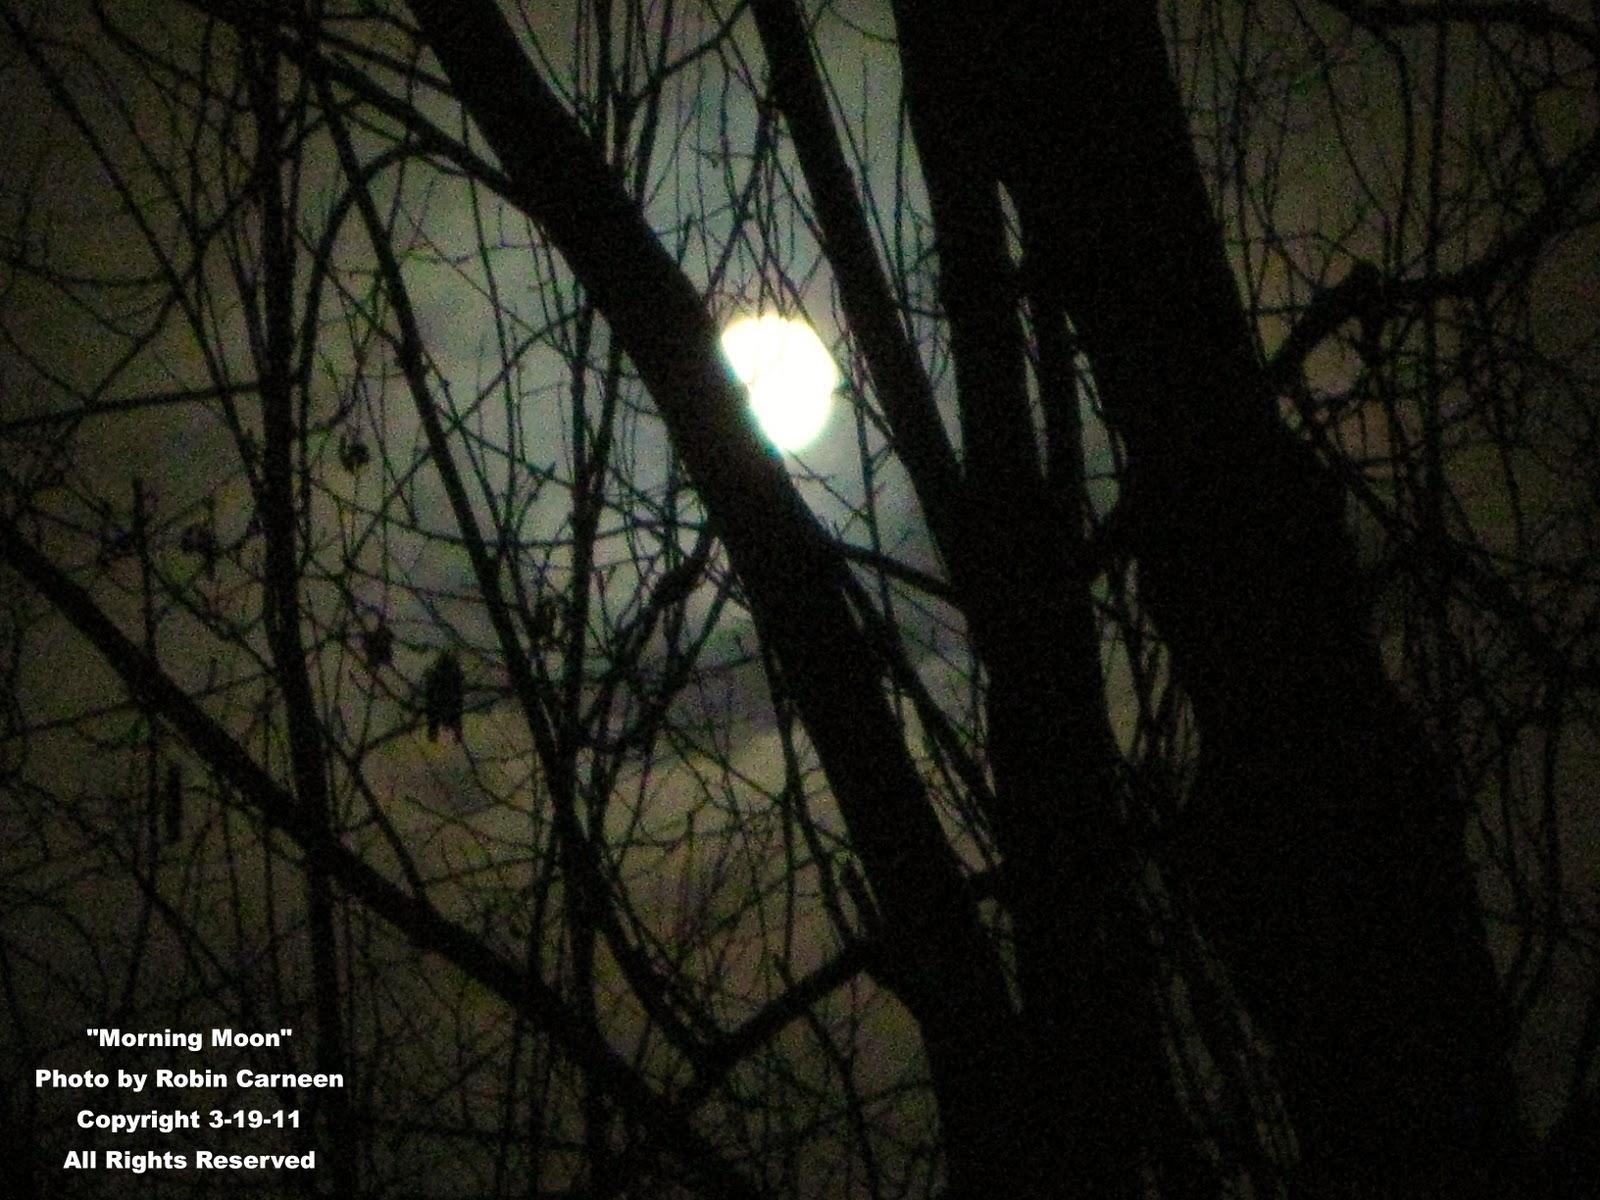 Farmers' Almanac Full Moon Dates 2016